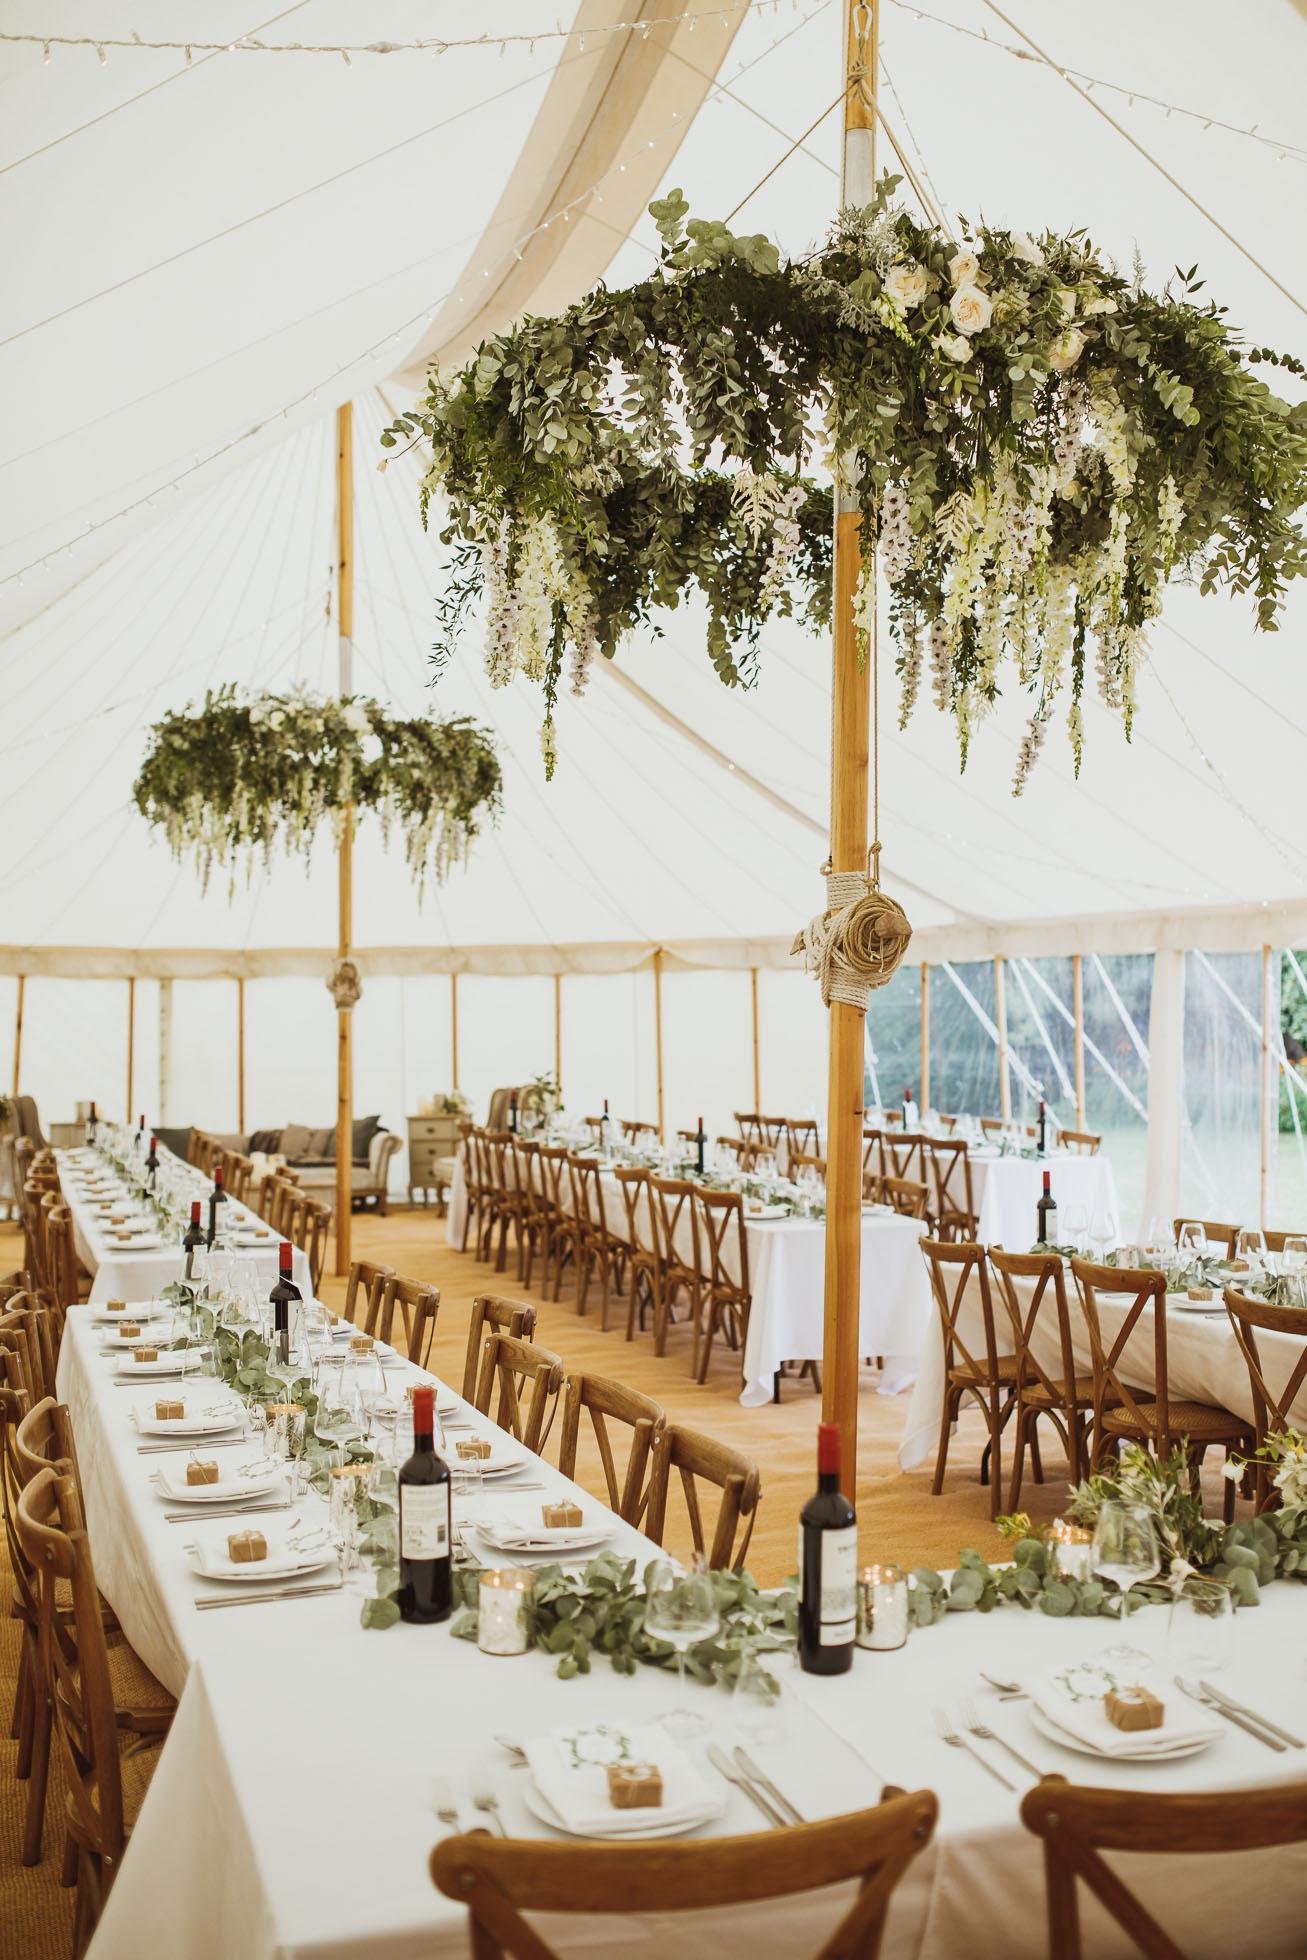 norton_conyers_wedding_photographer-39.jpg